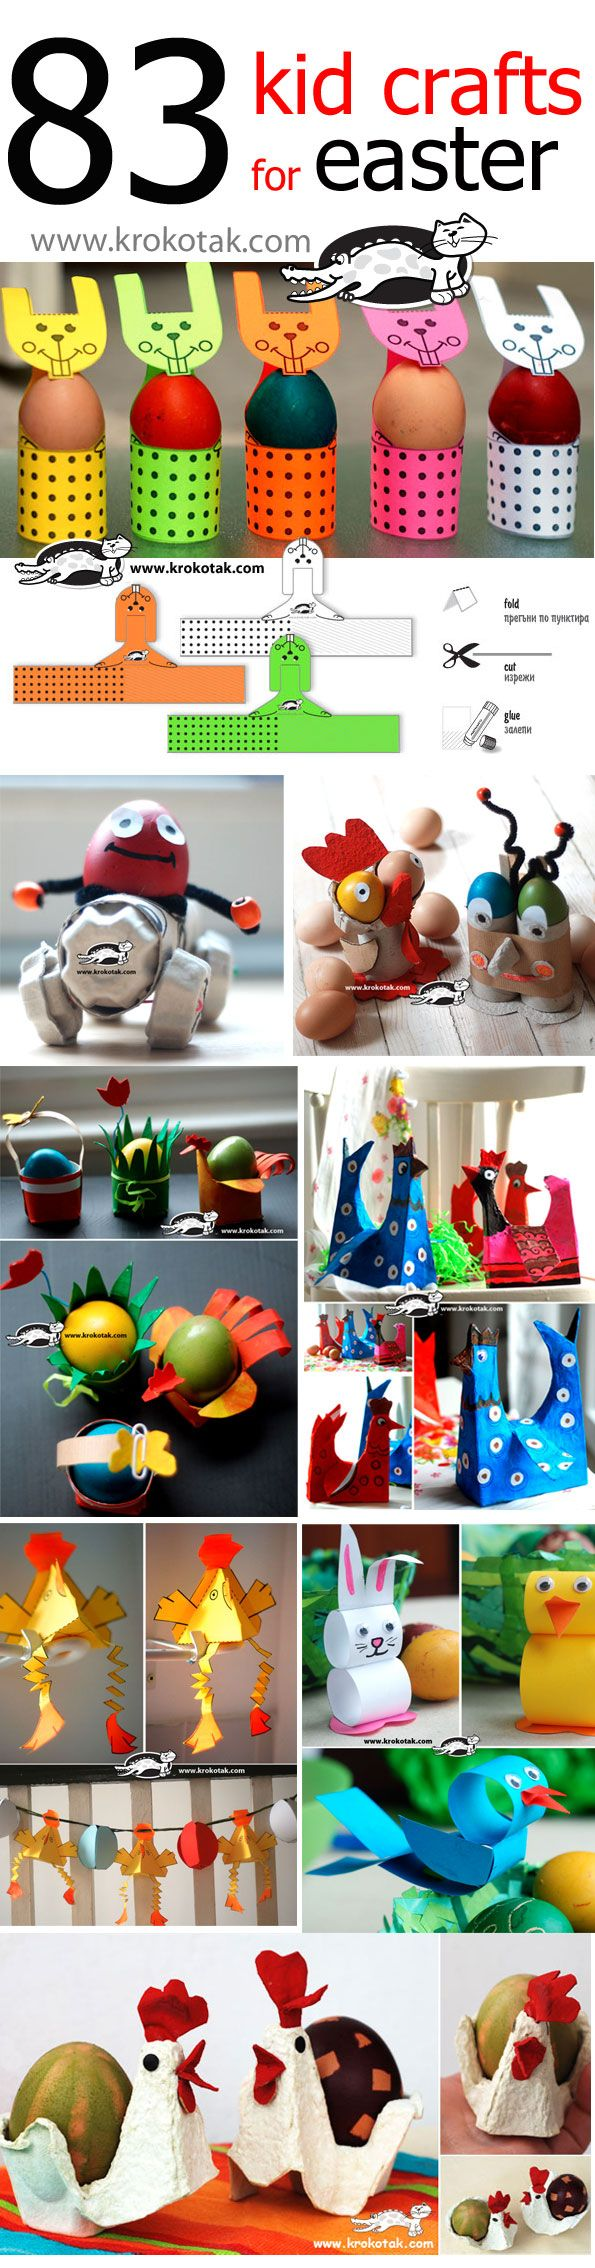 83 kid crafts for EASTER